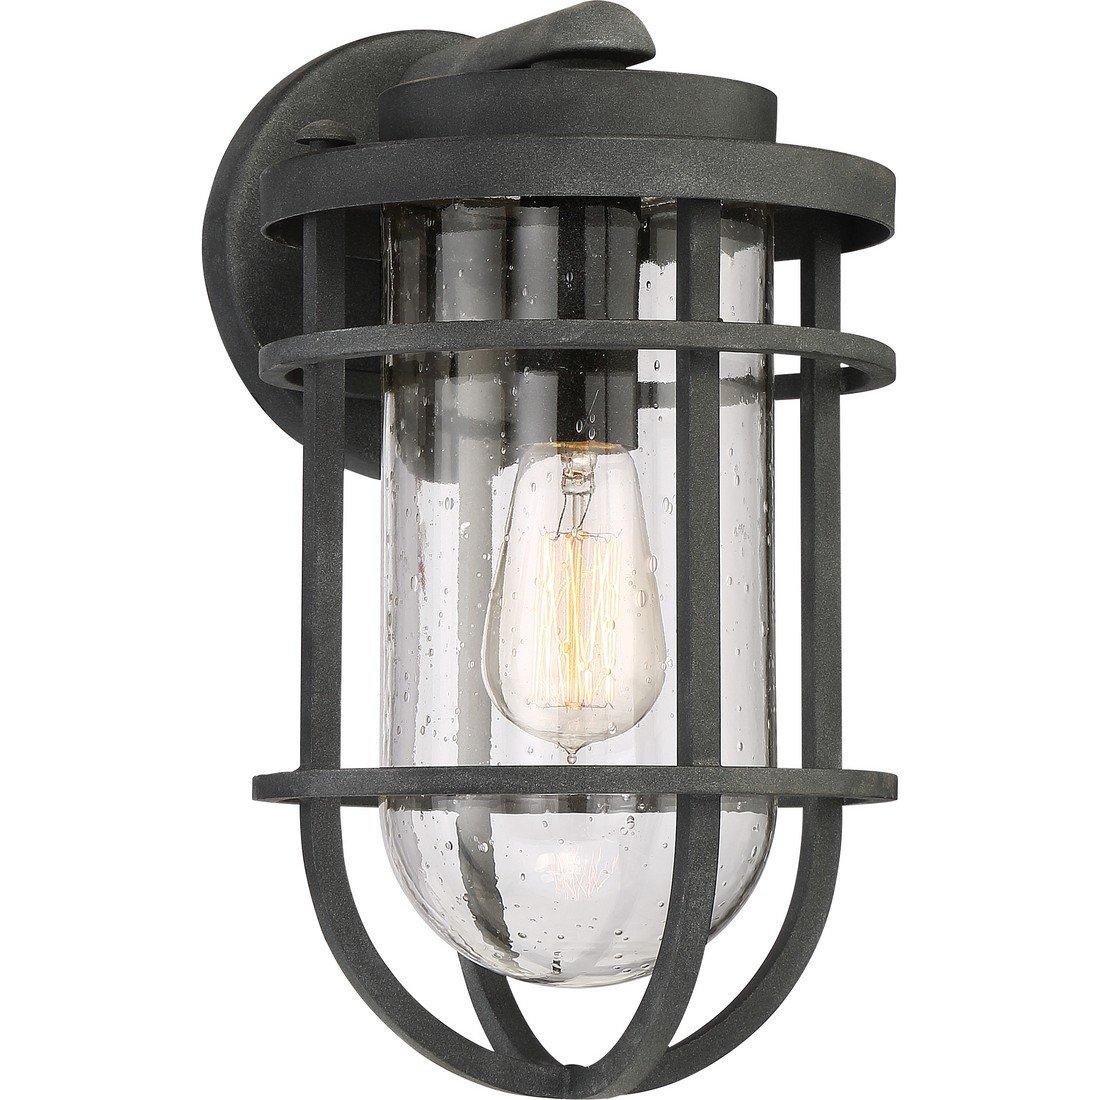 Quoizel One Light Outdoor Wall Lantern BRD8408MB, Medium, Mottled Black by Quoizel